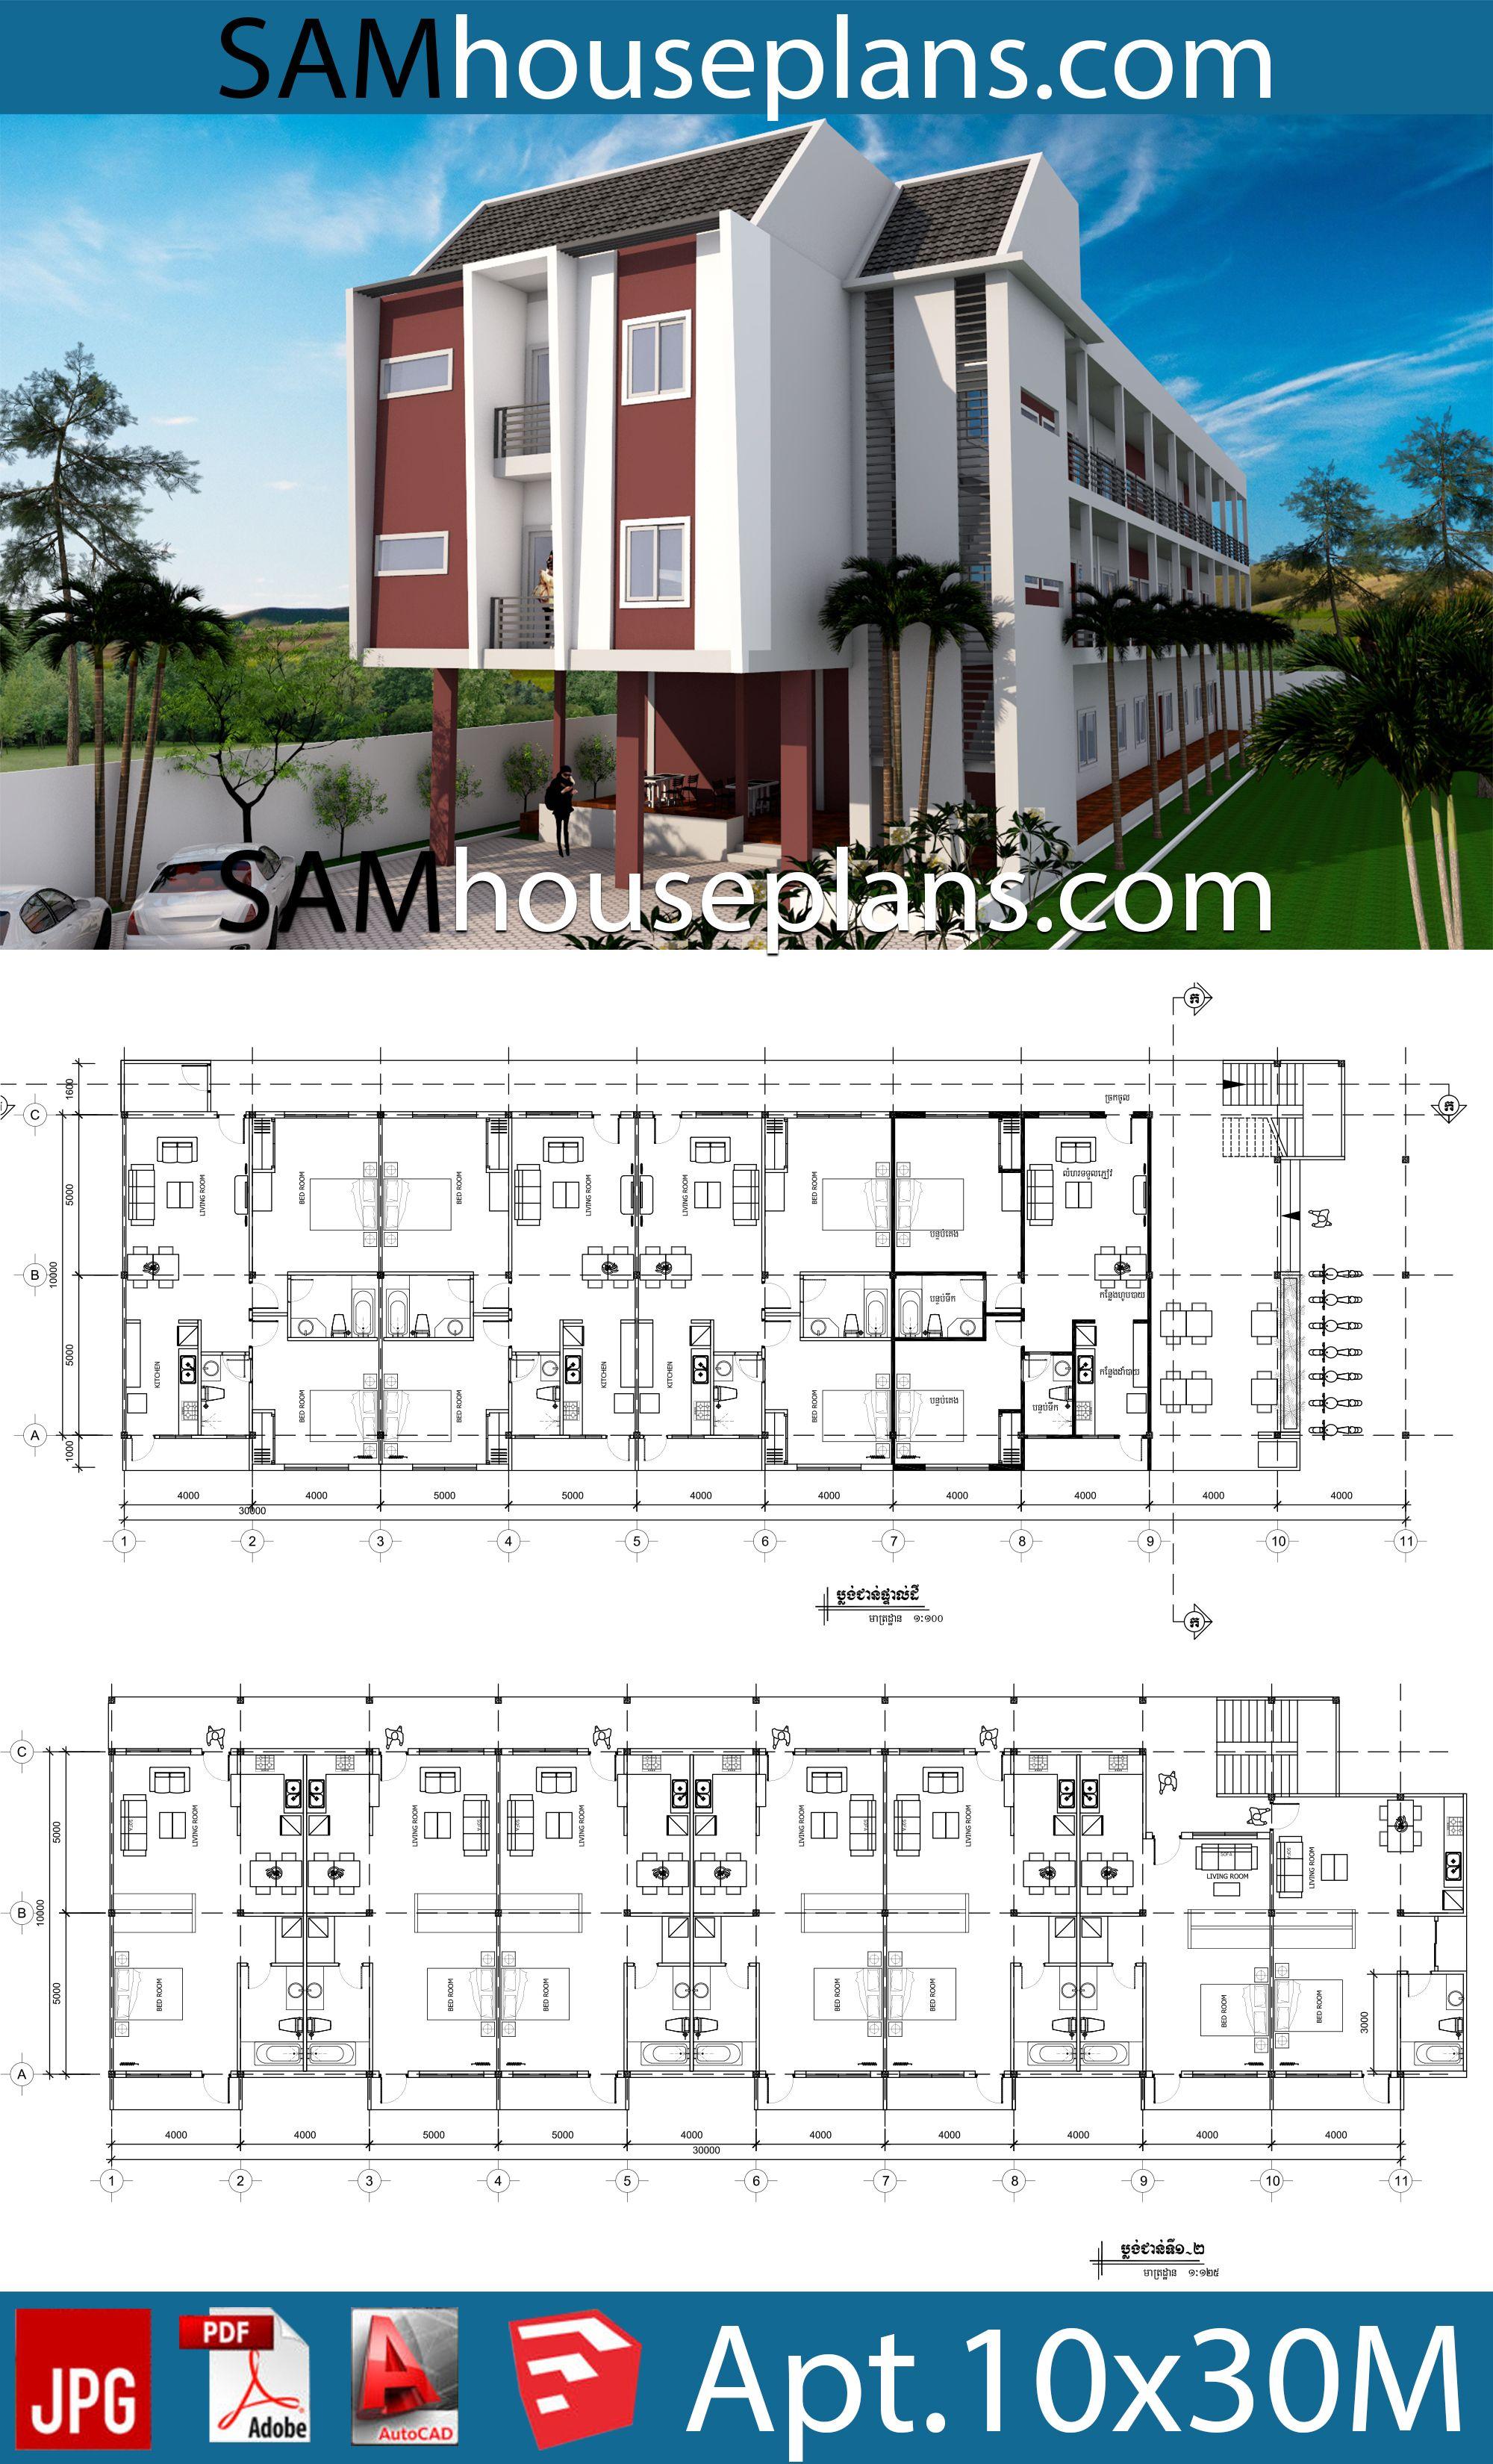 Apartment Plans 10x30 With 18 Units House Plans Free Downloads Apartment Plans Hotel Floor Plan Hotel Room Design Plan